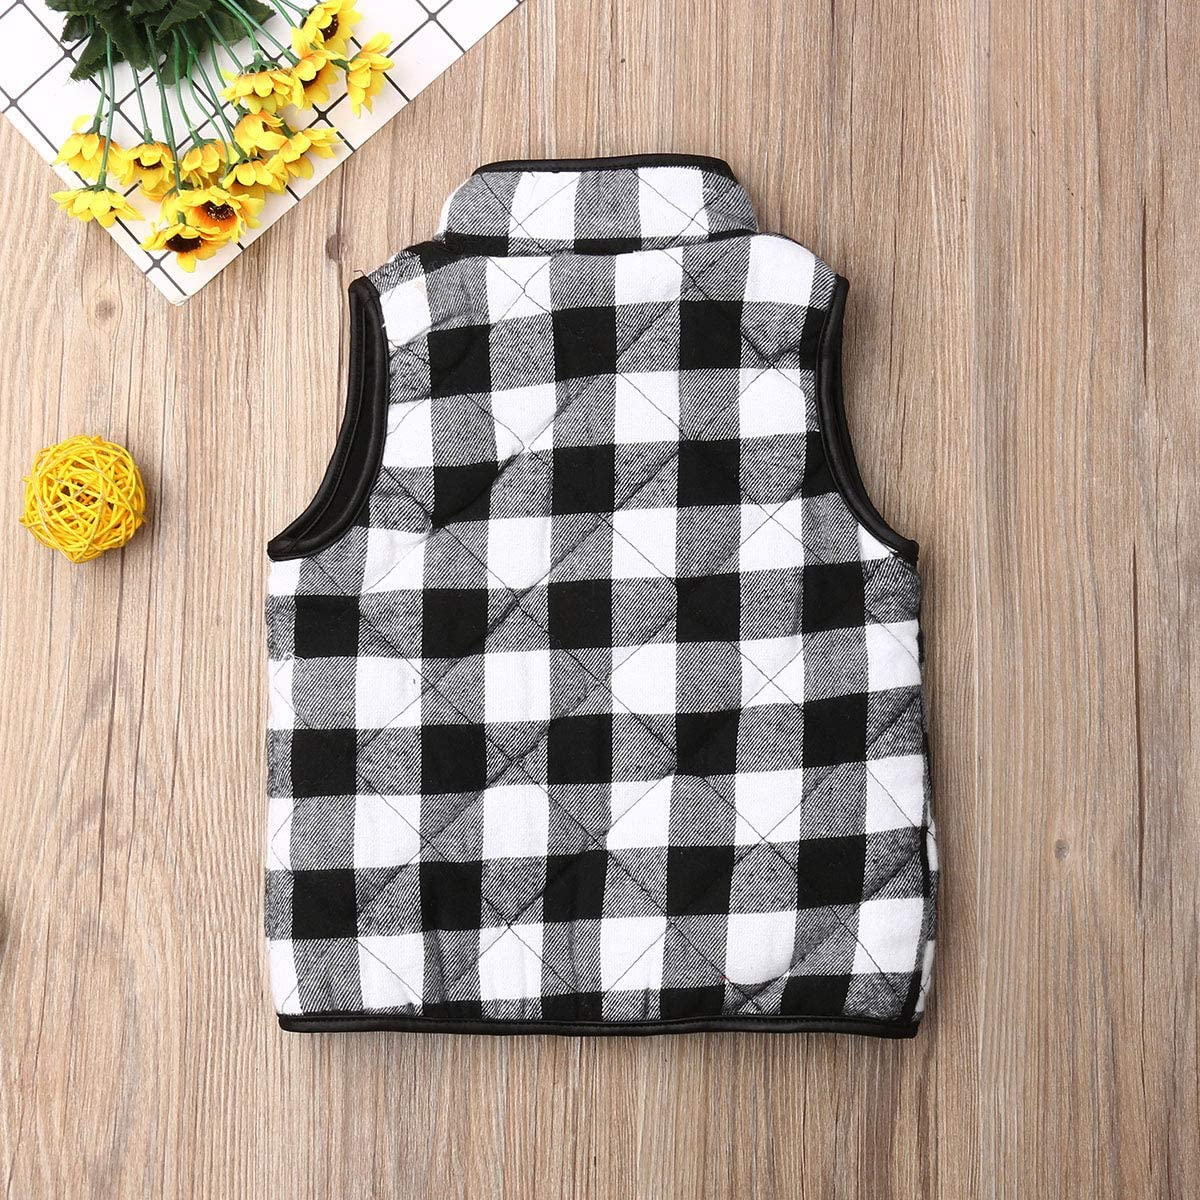 Toddler Baby Girls Vest Outwear Jacket Sleeveless Waistcoat Warm Winter Coats